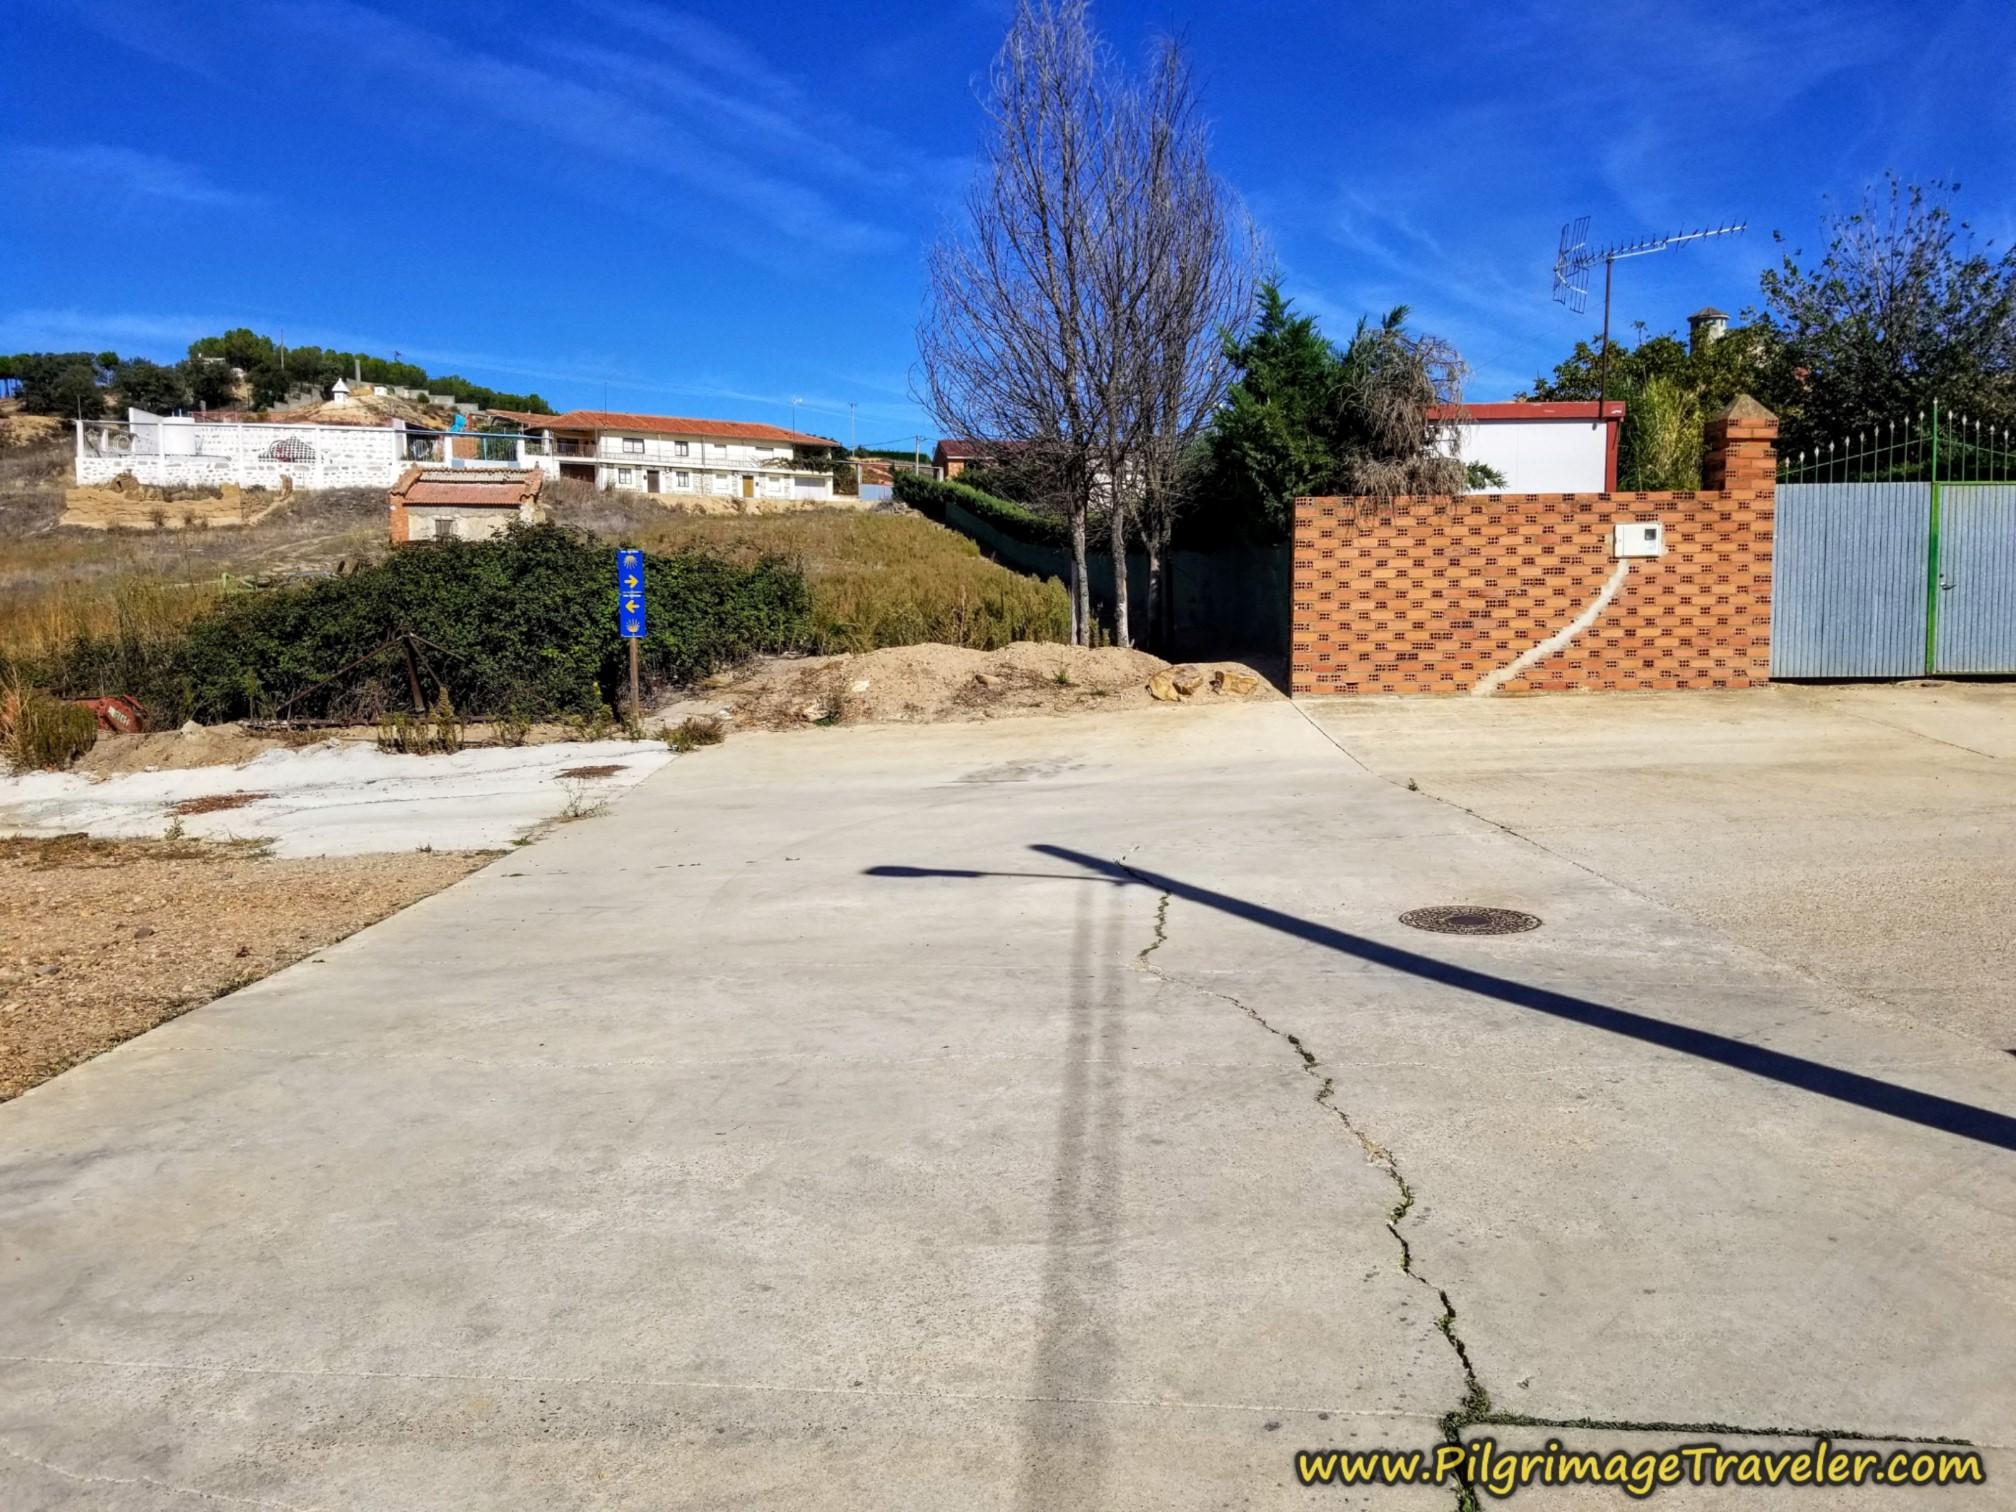 Bifurcation of Caminos